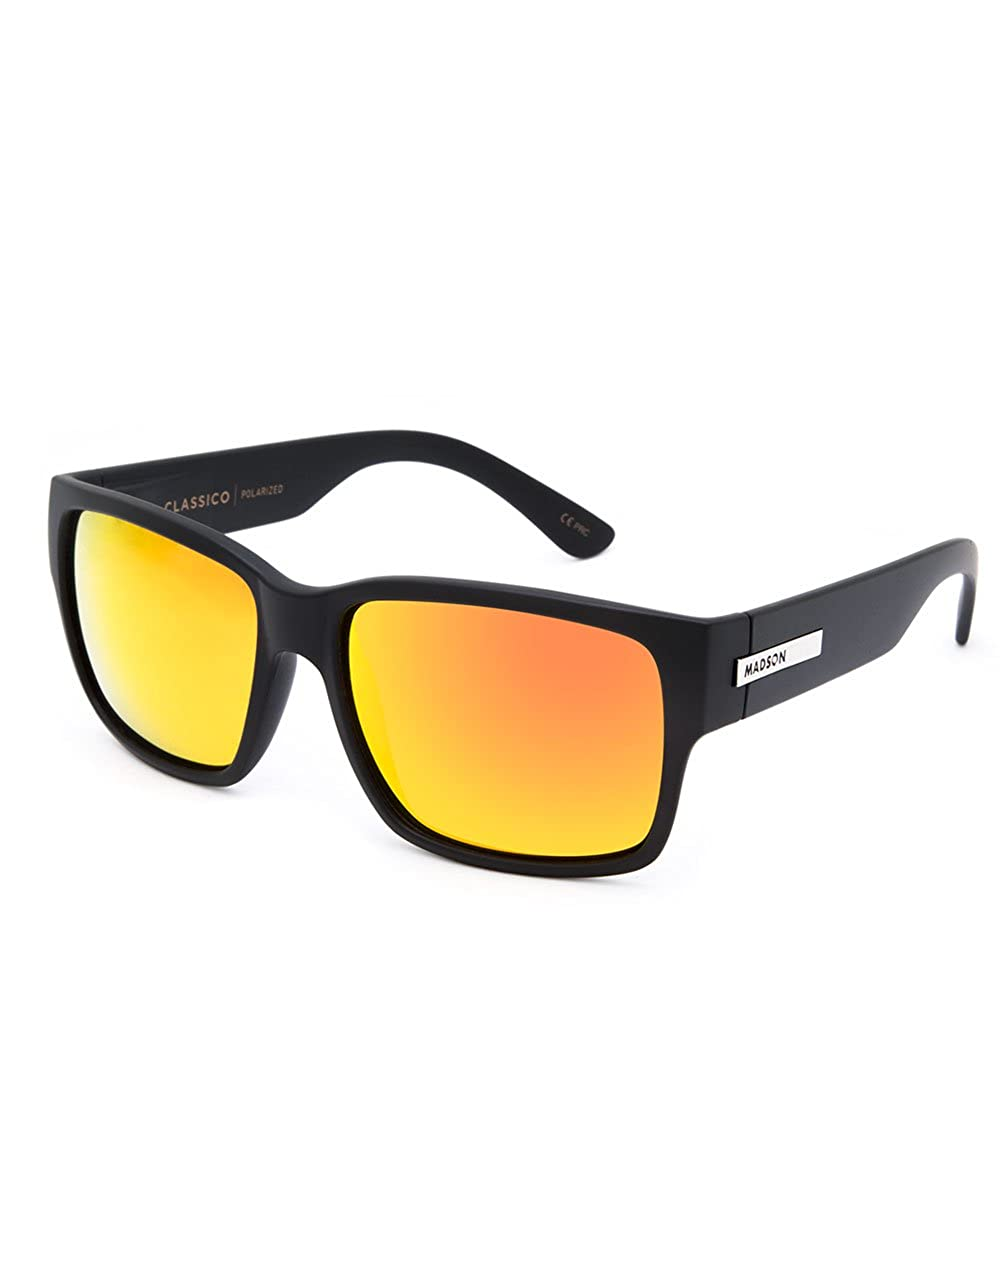 MADSON Classico Polarized Sunglasses